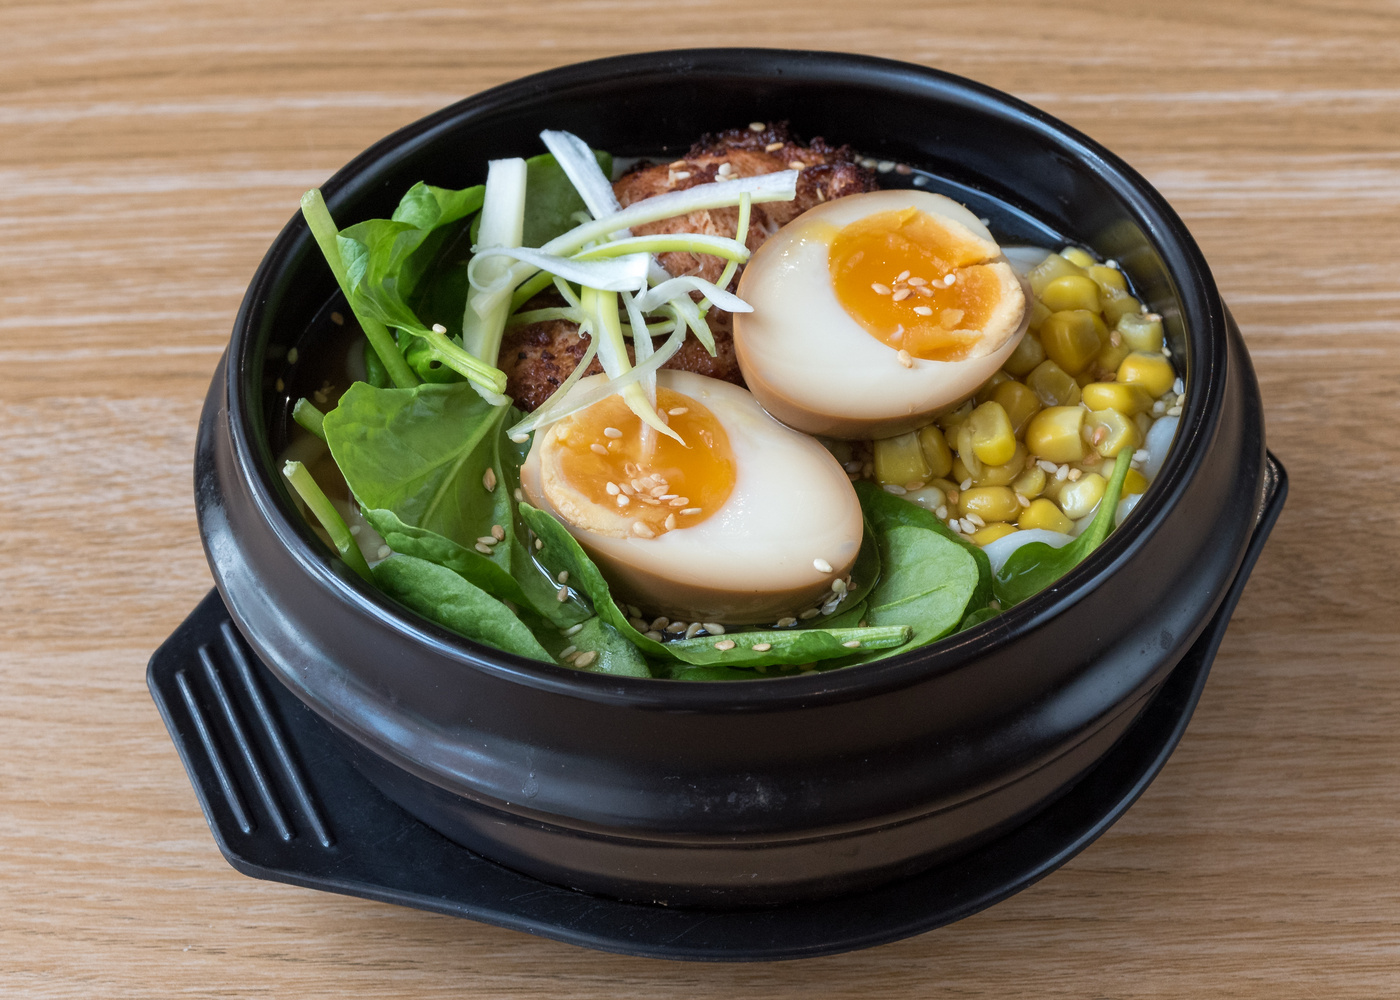 Korean Udon Noodle Soup by Kevin Drury